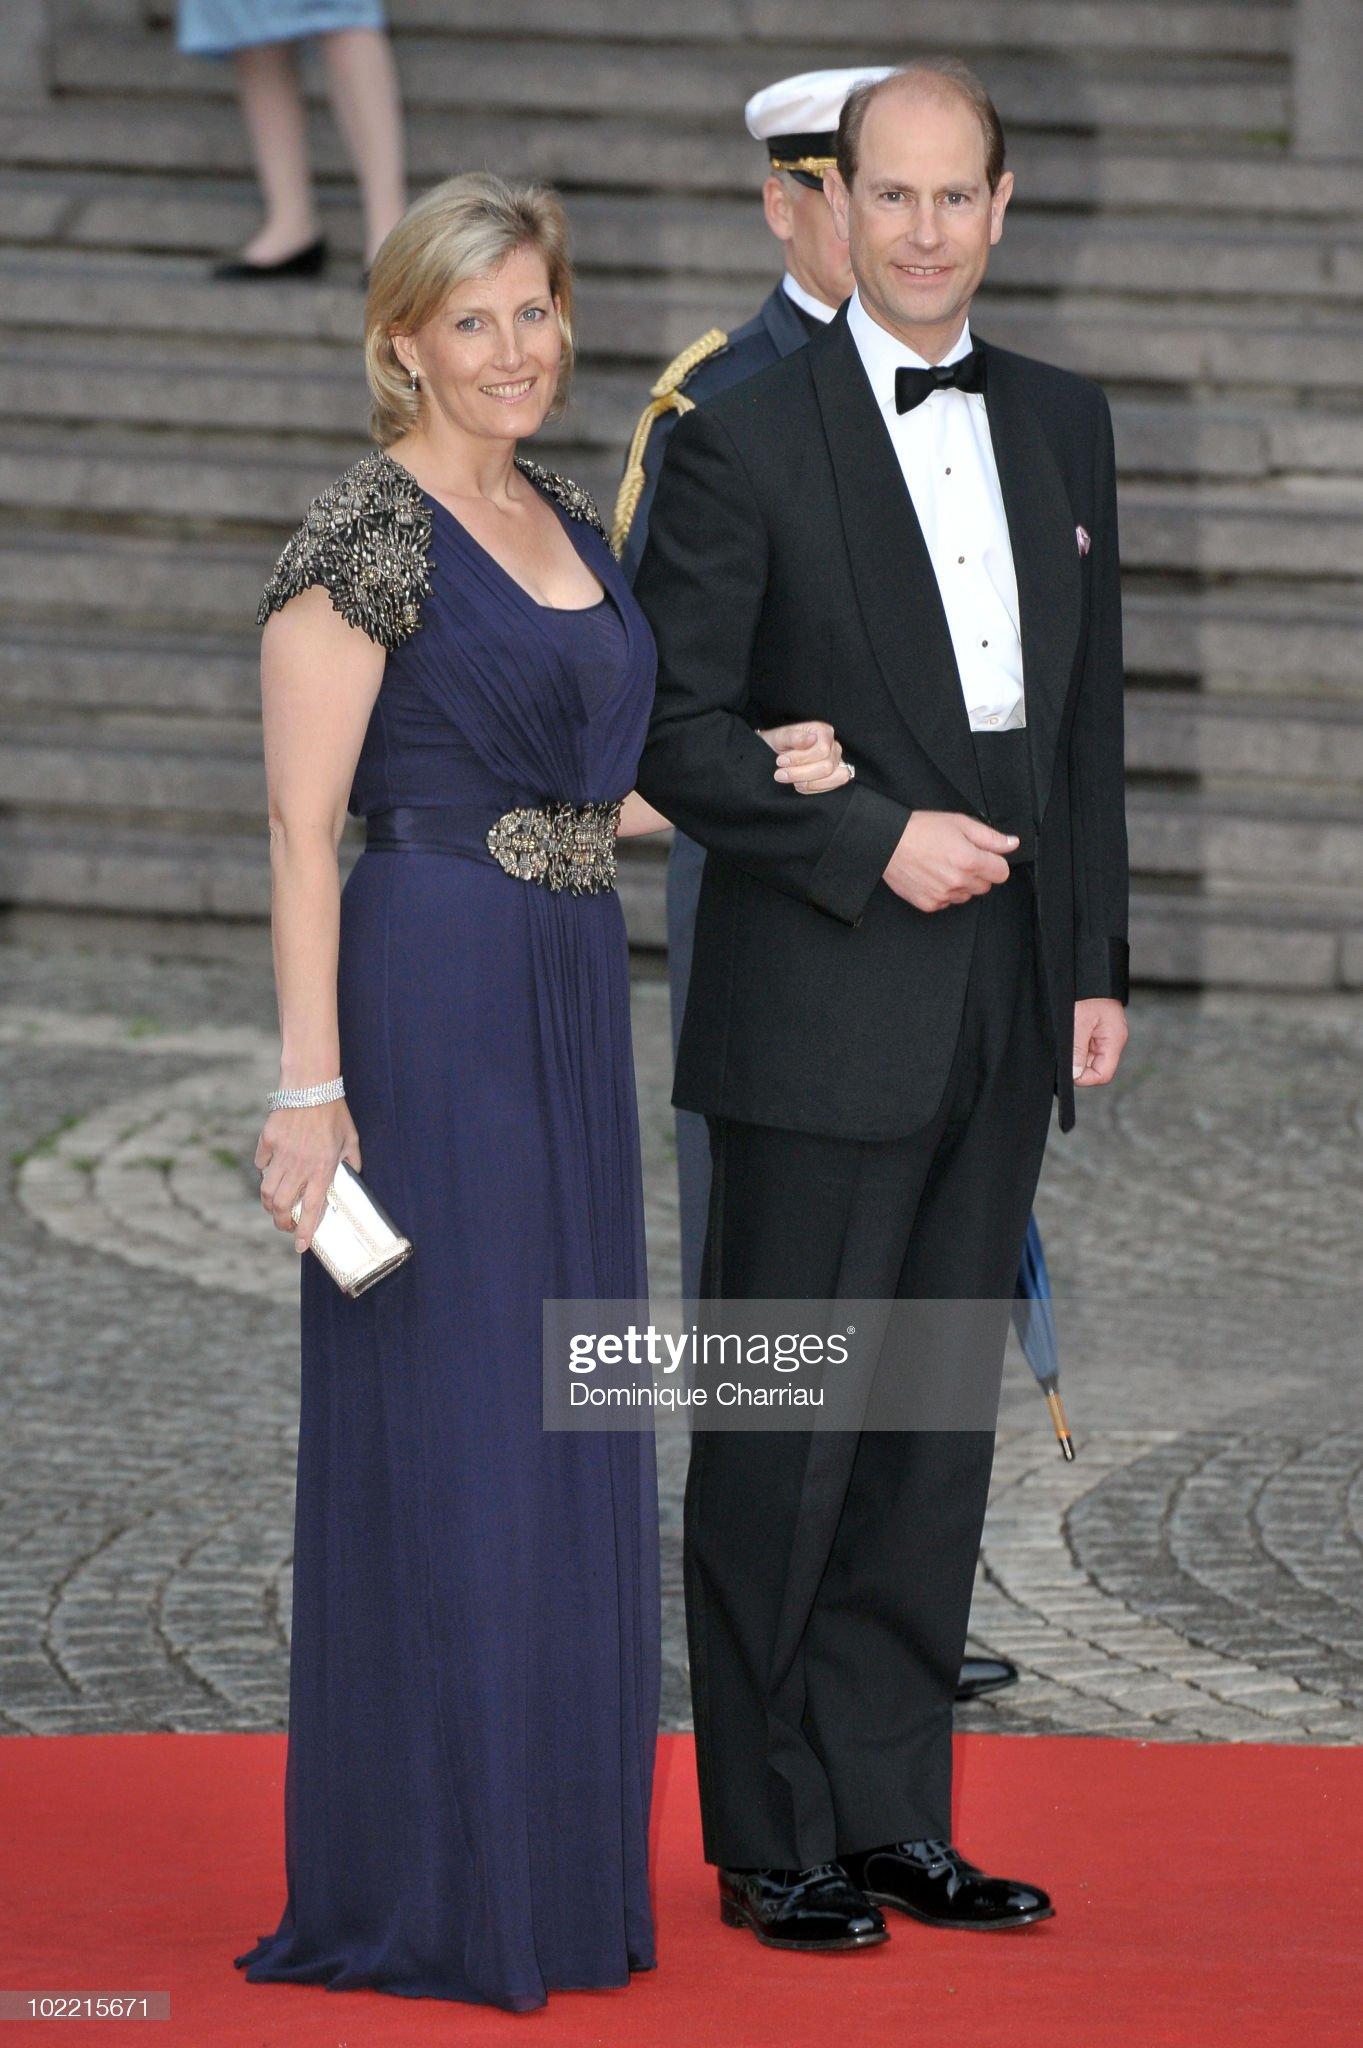 Crown Princess Victoria And Daniel Westling Wedding - Gala Performance - Arrivals : News Photo